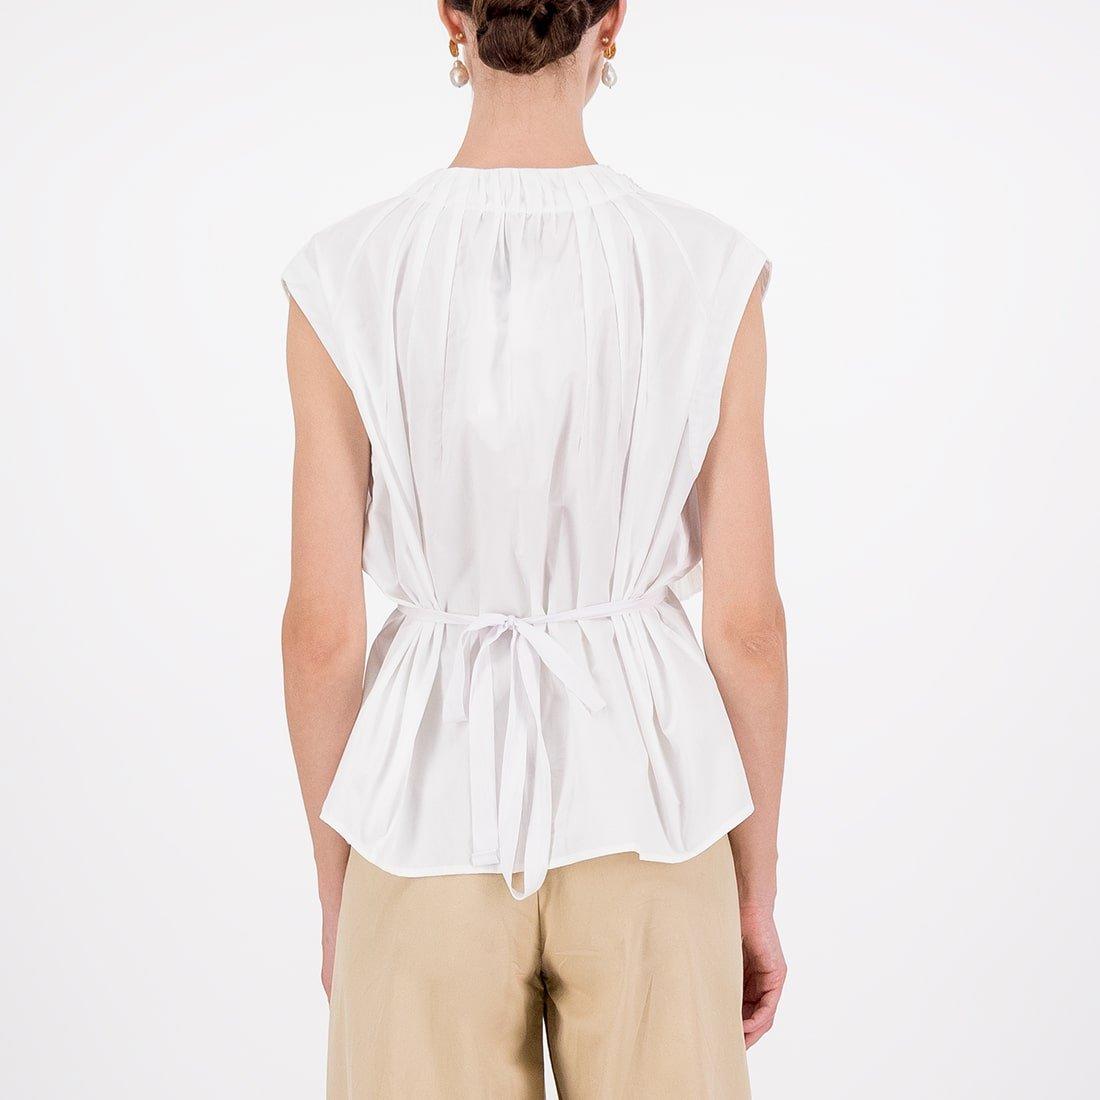 Fabric blend asymmetrical sleeveless top 3